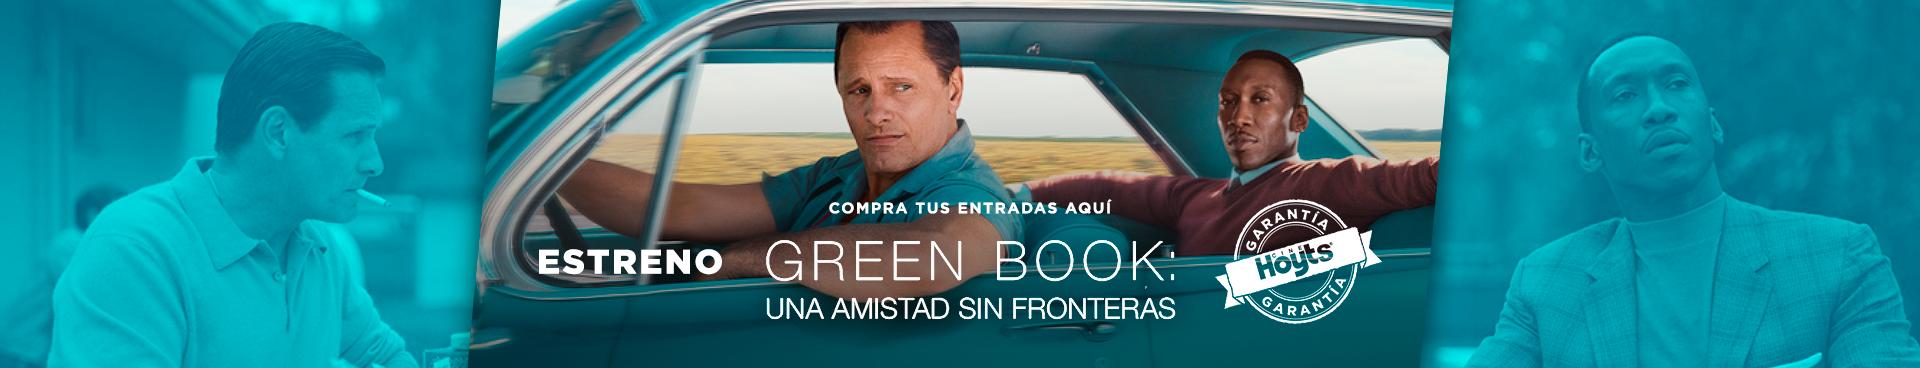 ESTRENO: GREEN BOOK - GARANTÍA CINEHOYTS, COMPRA TUS ENTRADAS AQUÍ